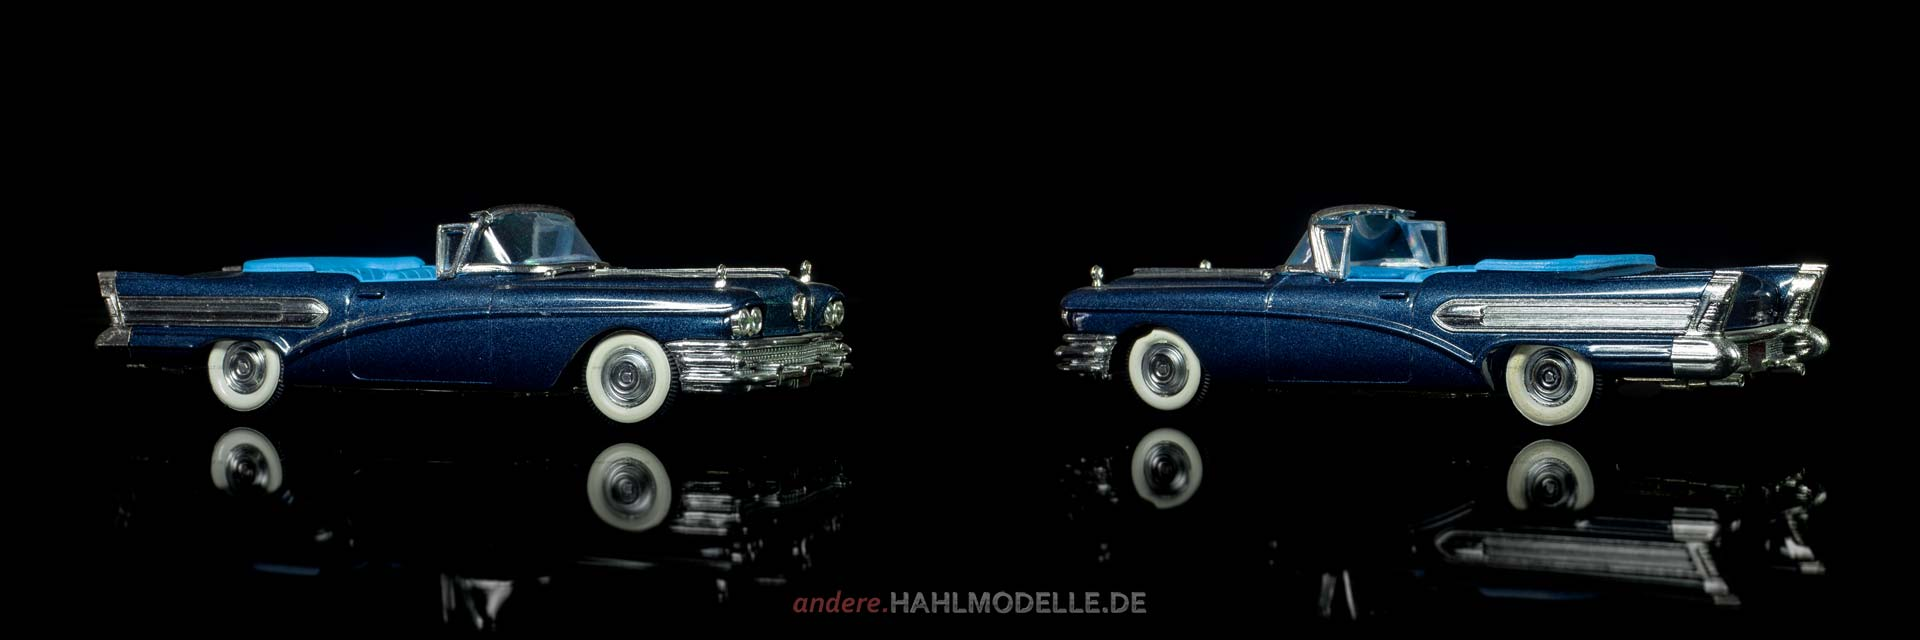 Buick Serie 75 Roadmaster Riviera Convertible | Cabriolet | Vitesse | 1:43 | www.andere.hahlmodelle.de